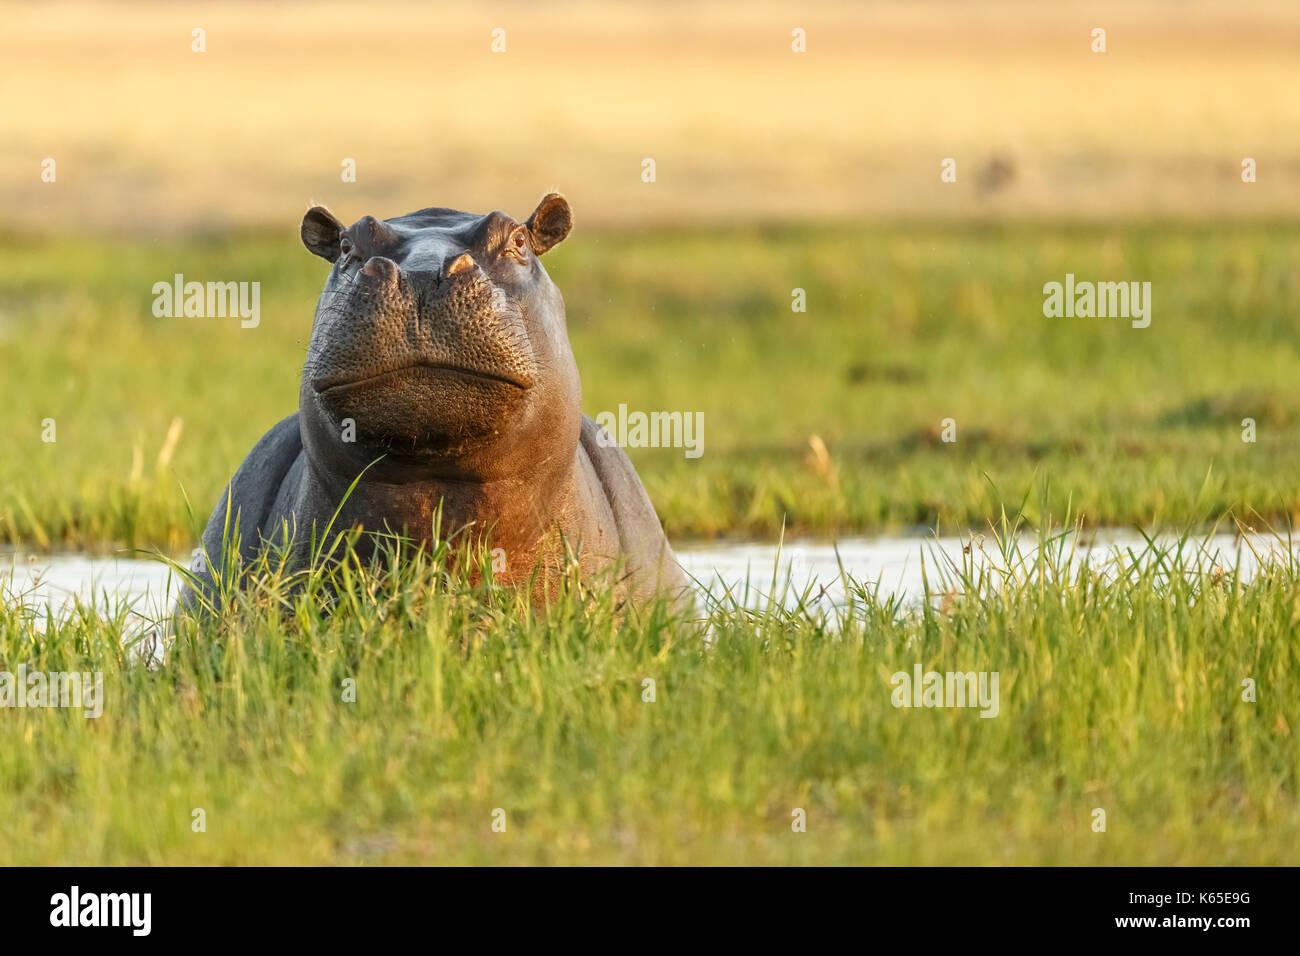 Hippopotame (Hippopotamus amphibious), un défi dans la rivière Kwai, botswana Photo Stock